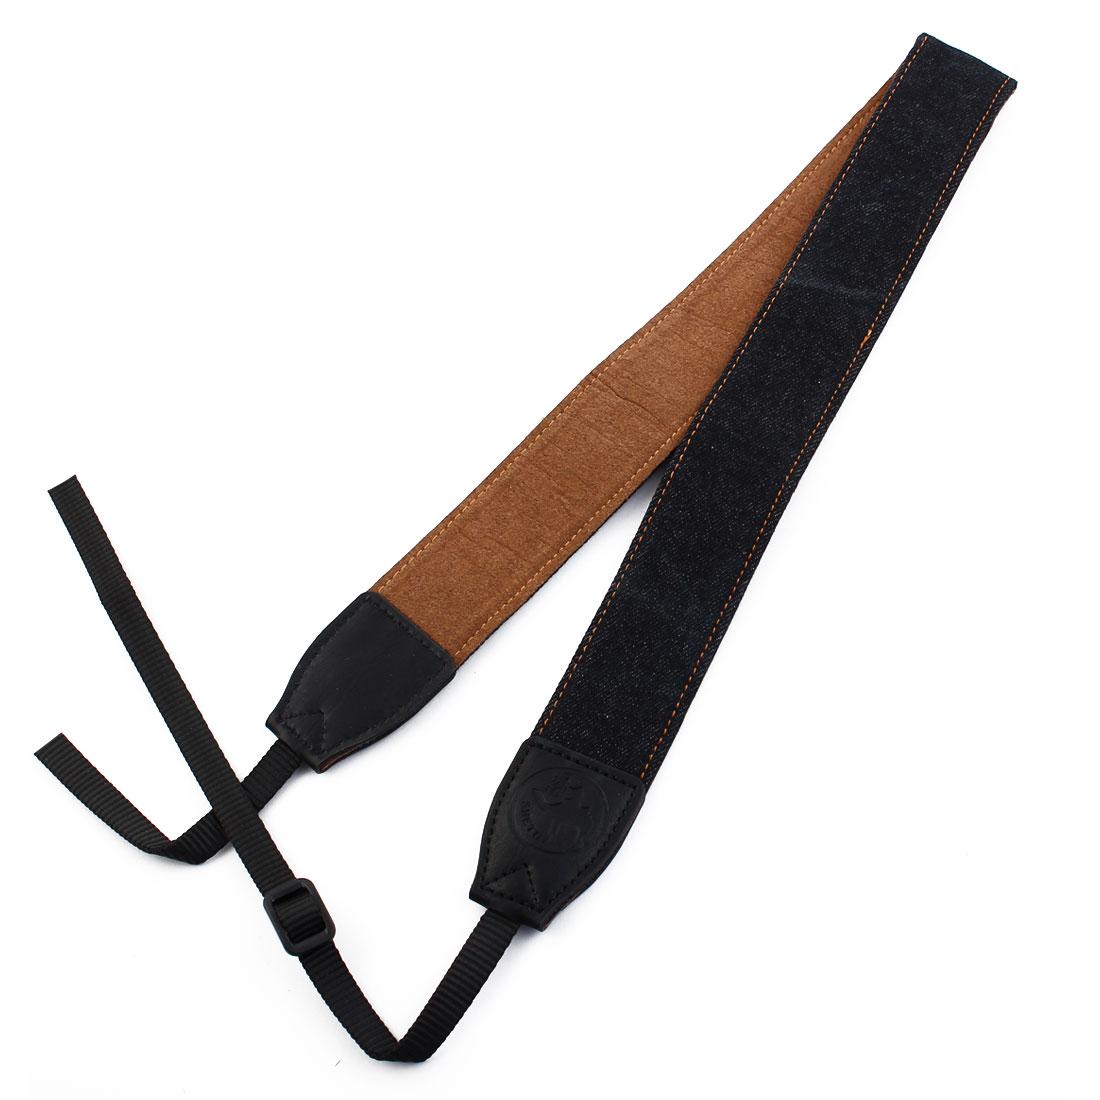 SHETU Authorized Universal Denim Camera Shoulder Neck Belt Strap Black for DSLR